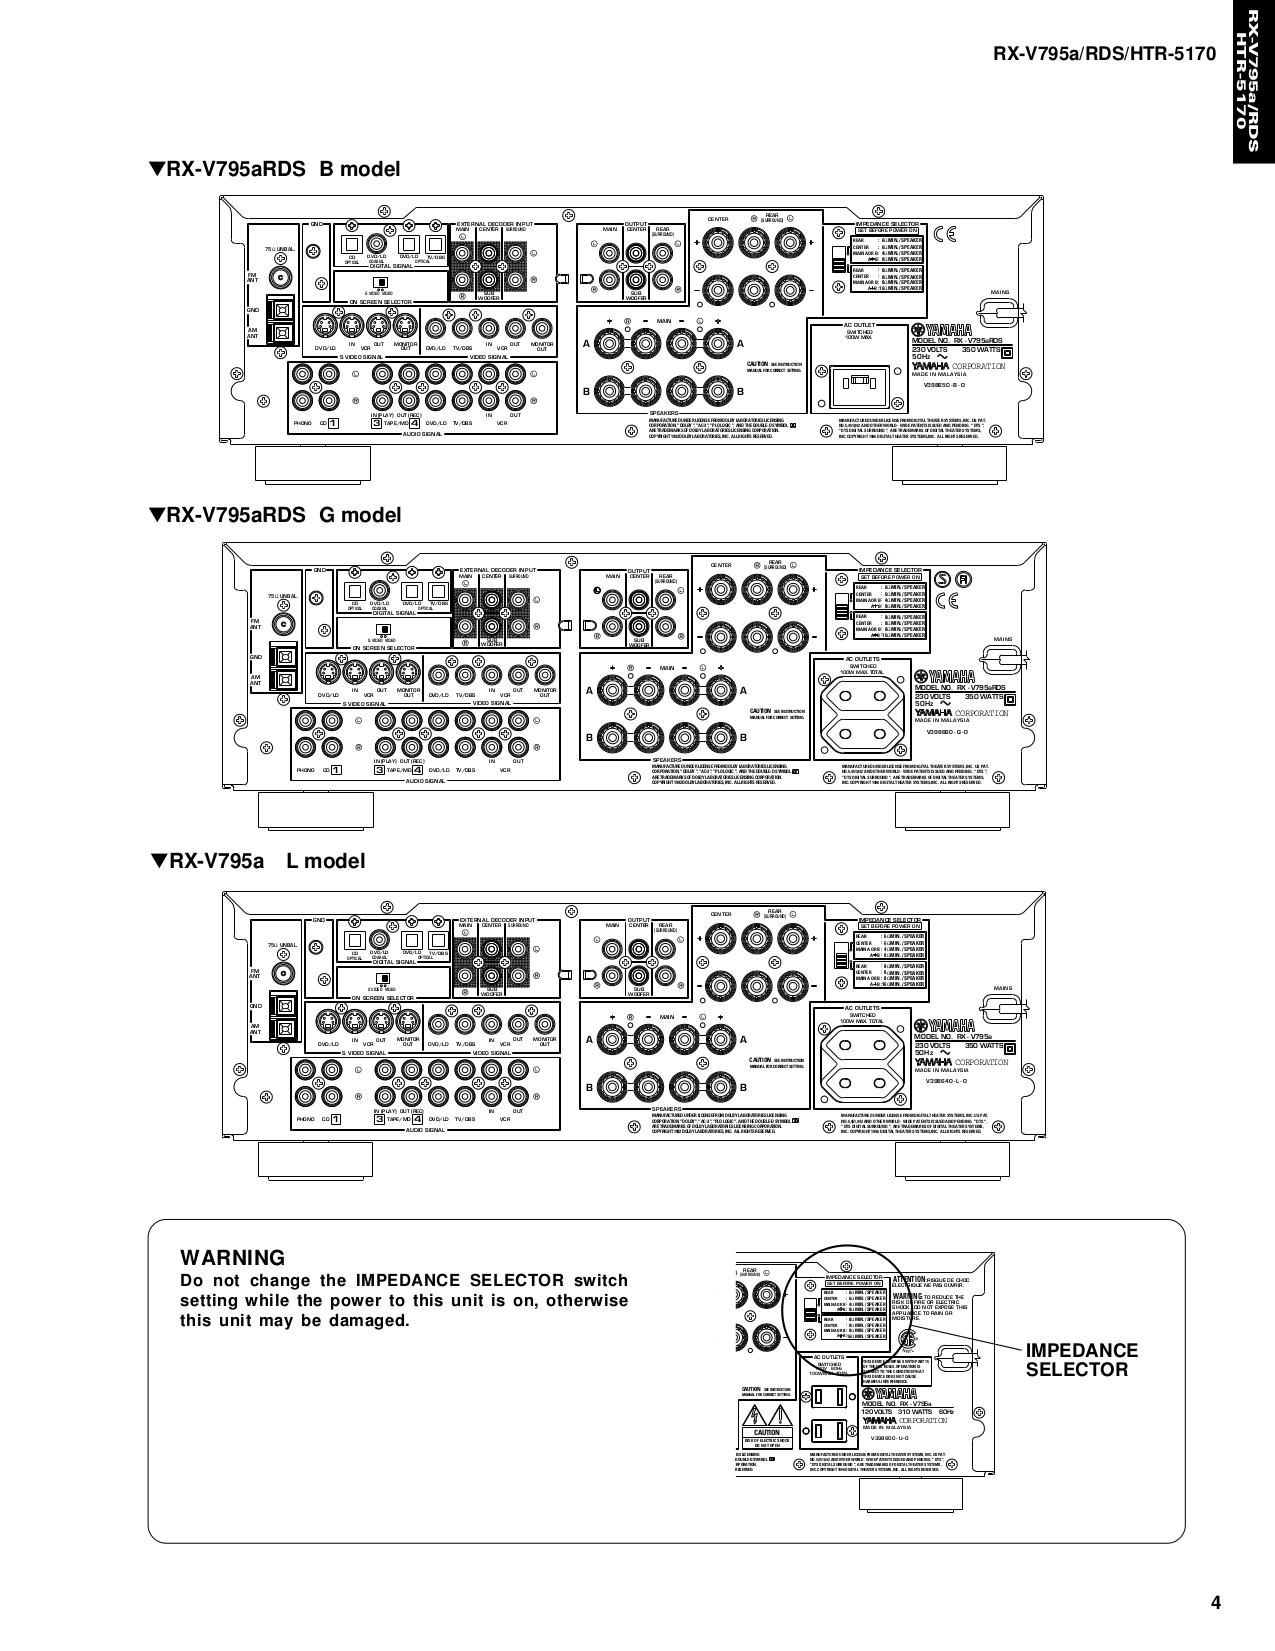 pdf manual for yamaha receiver rx v795 rh umlib com yamaha rx v795rds notice yamaha rx v795 manual pdf